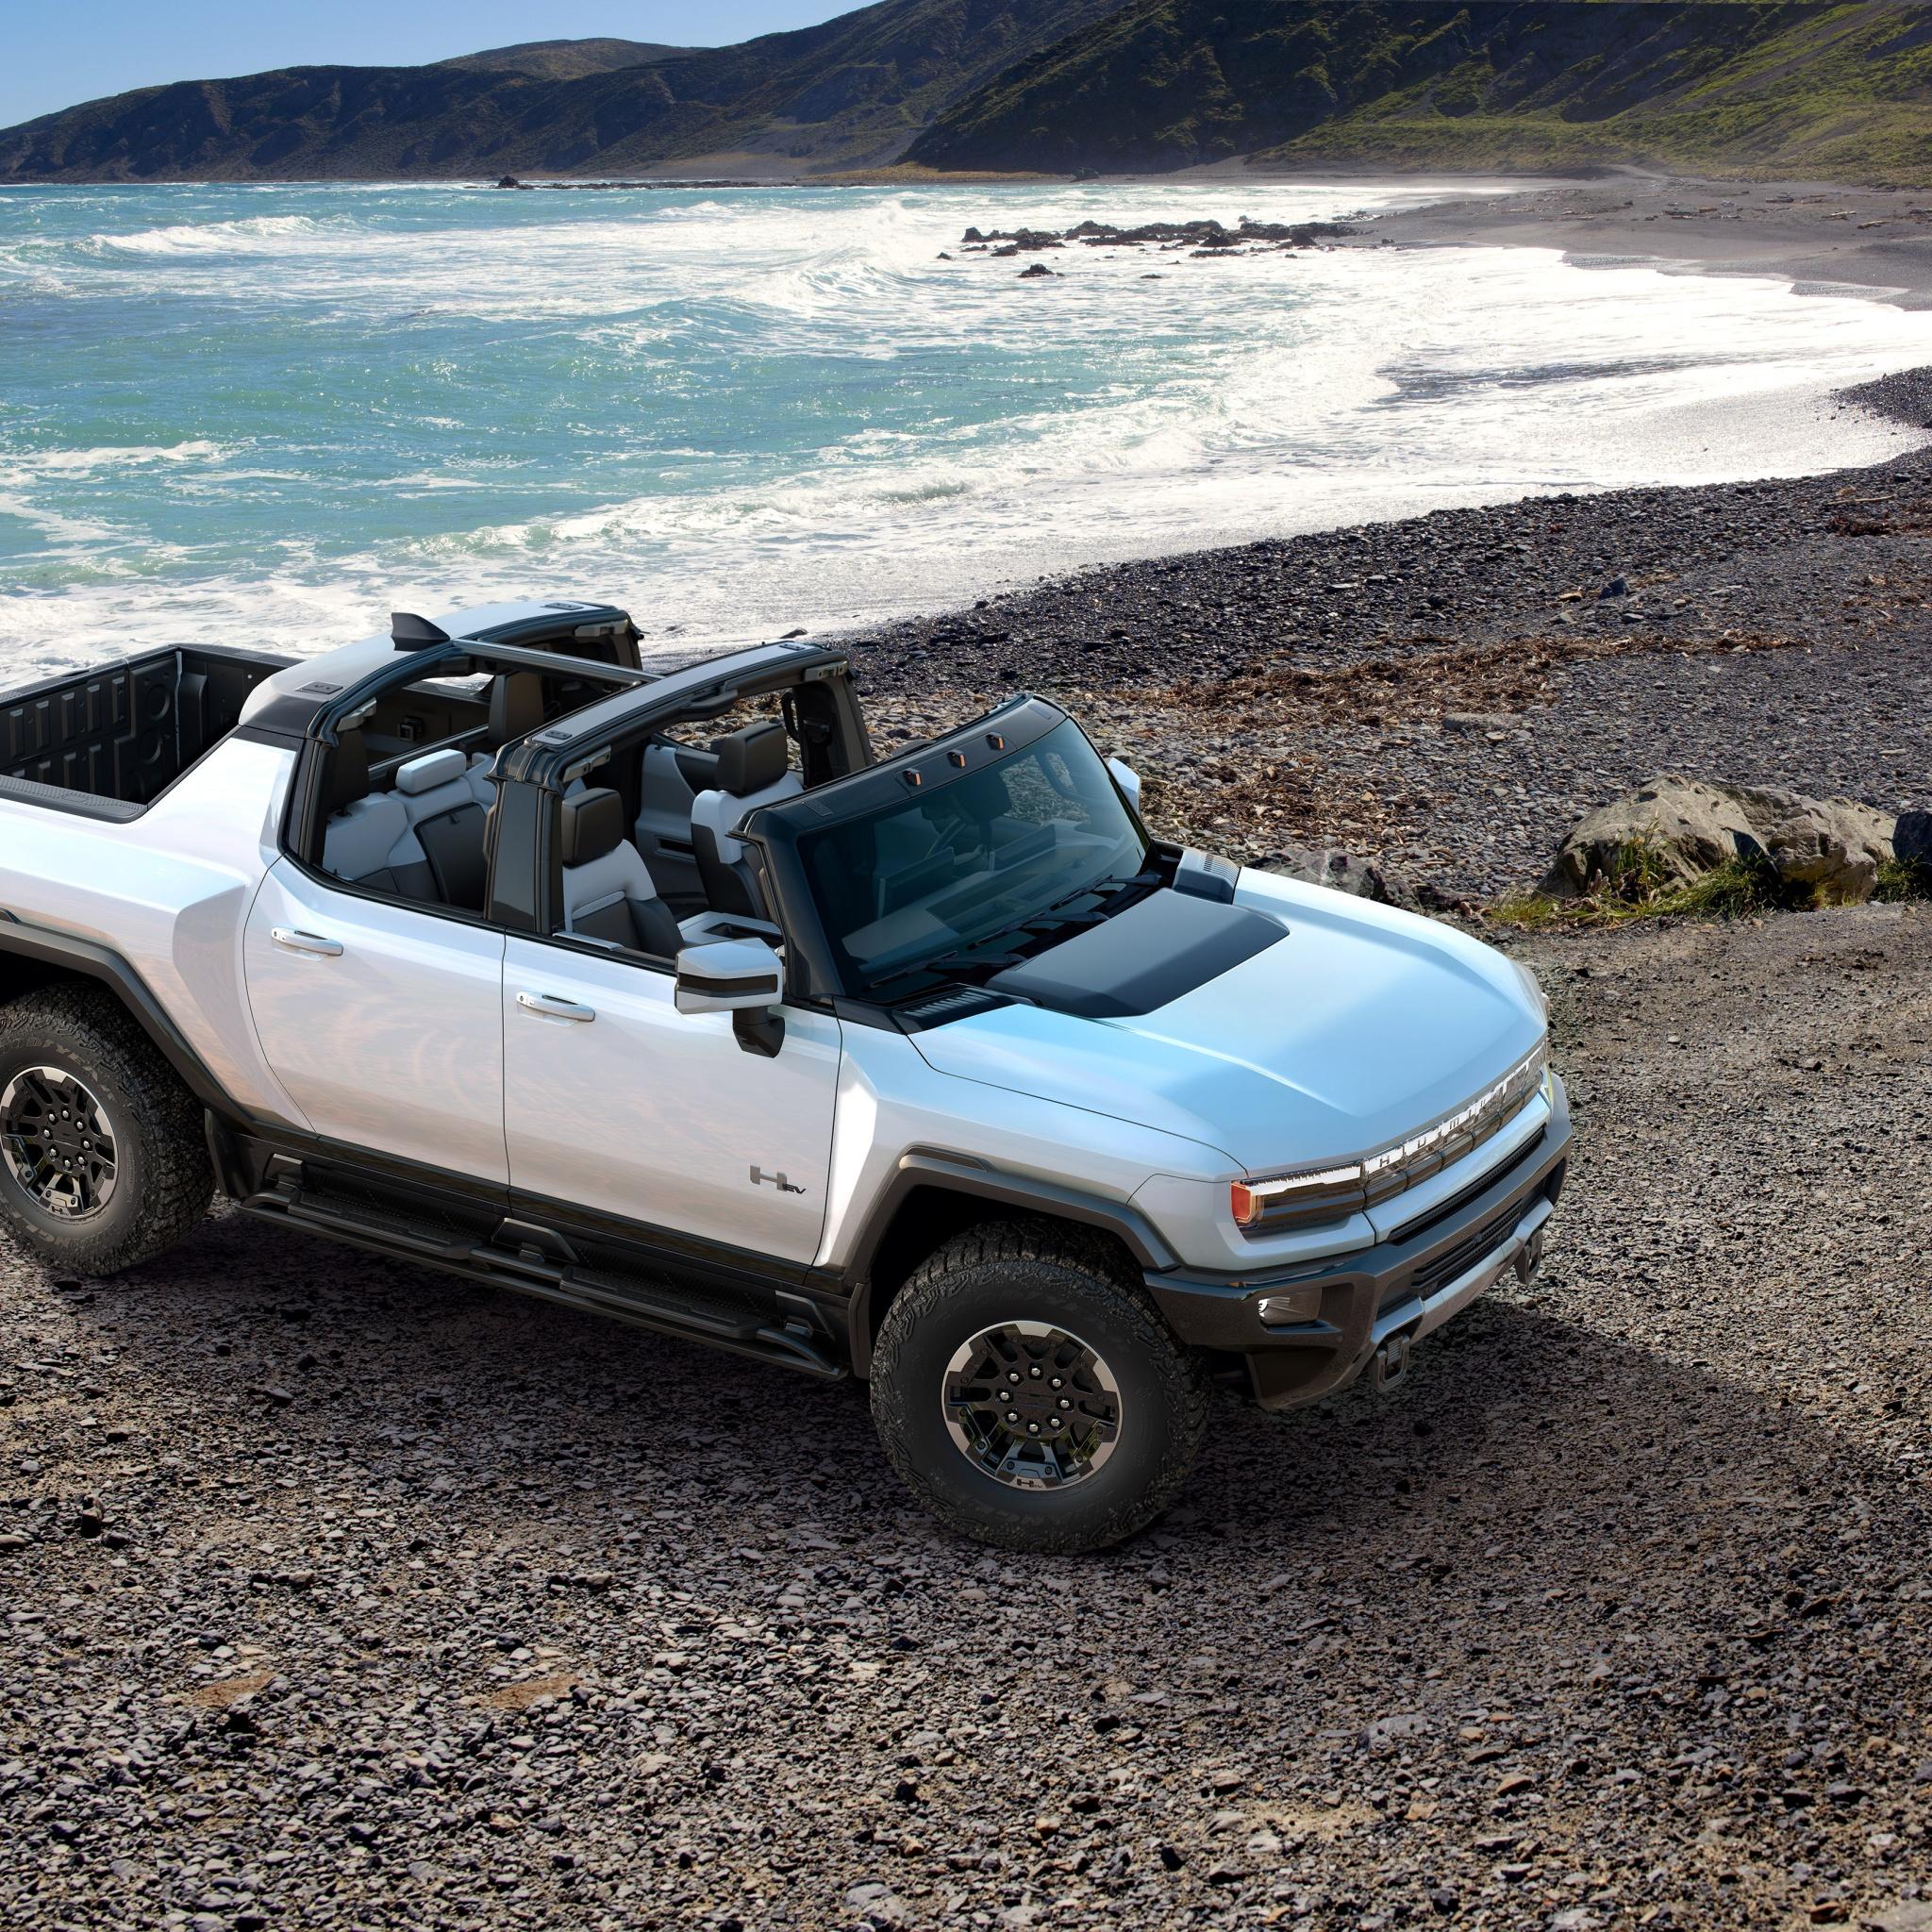 Gmc Hummer Ev 4k Wallpaper Electric Suv Beach Sunset Luxury Suv Electric Trucks 2022 5k Cars 3122